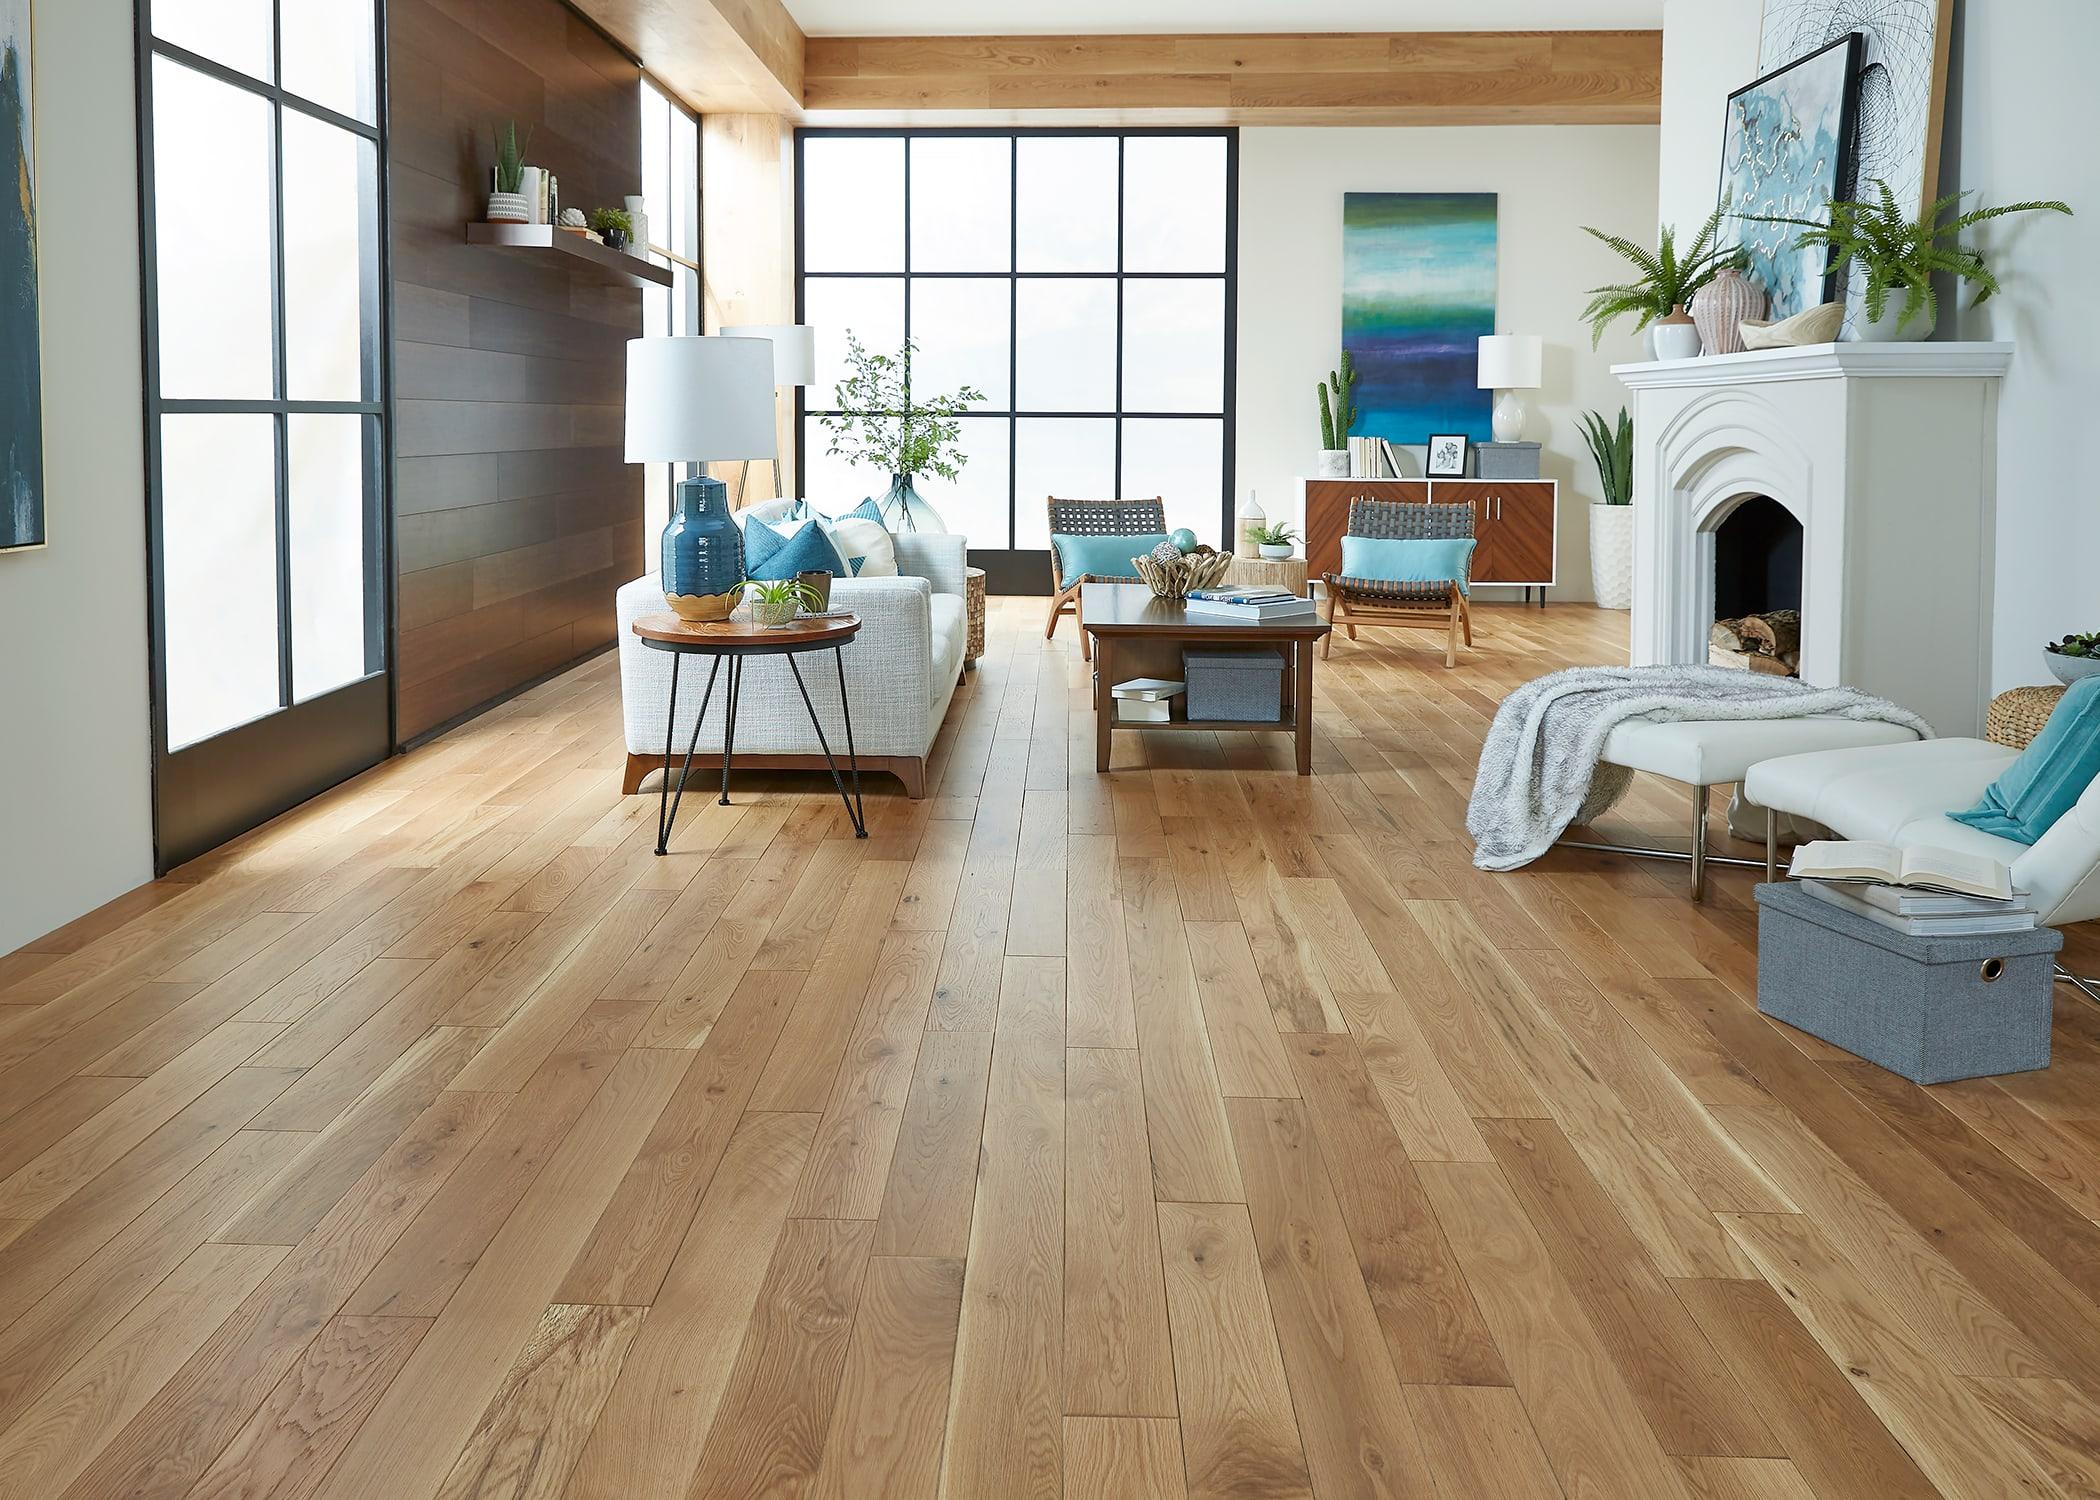 LL Flooring | Hardwood, Vinyl, Laminate, Tile & Flooring ...